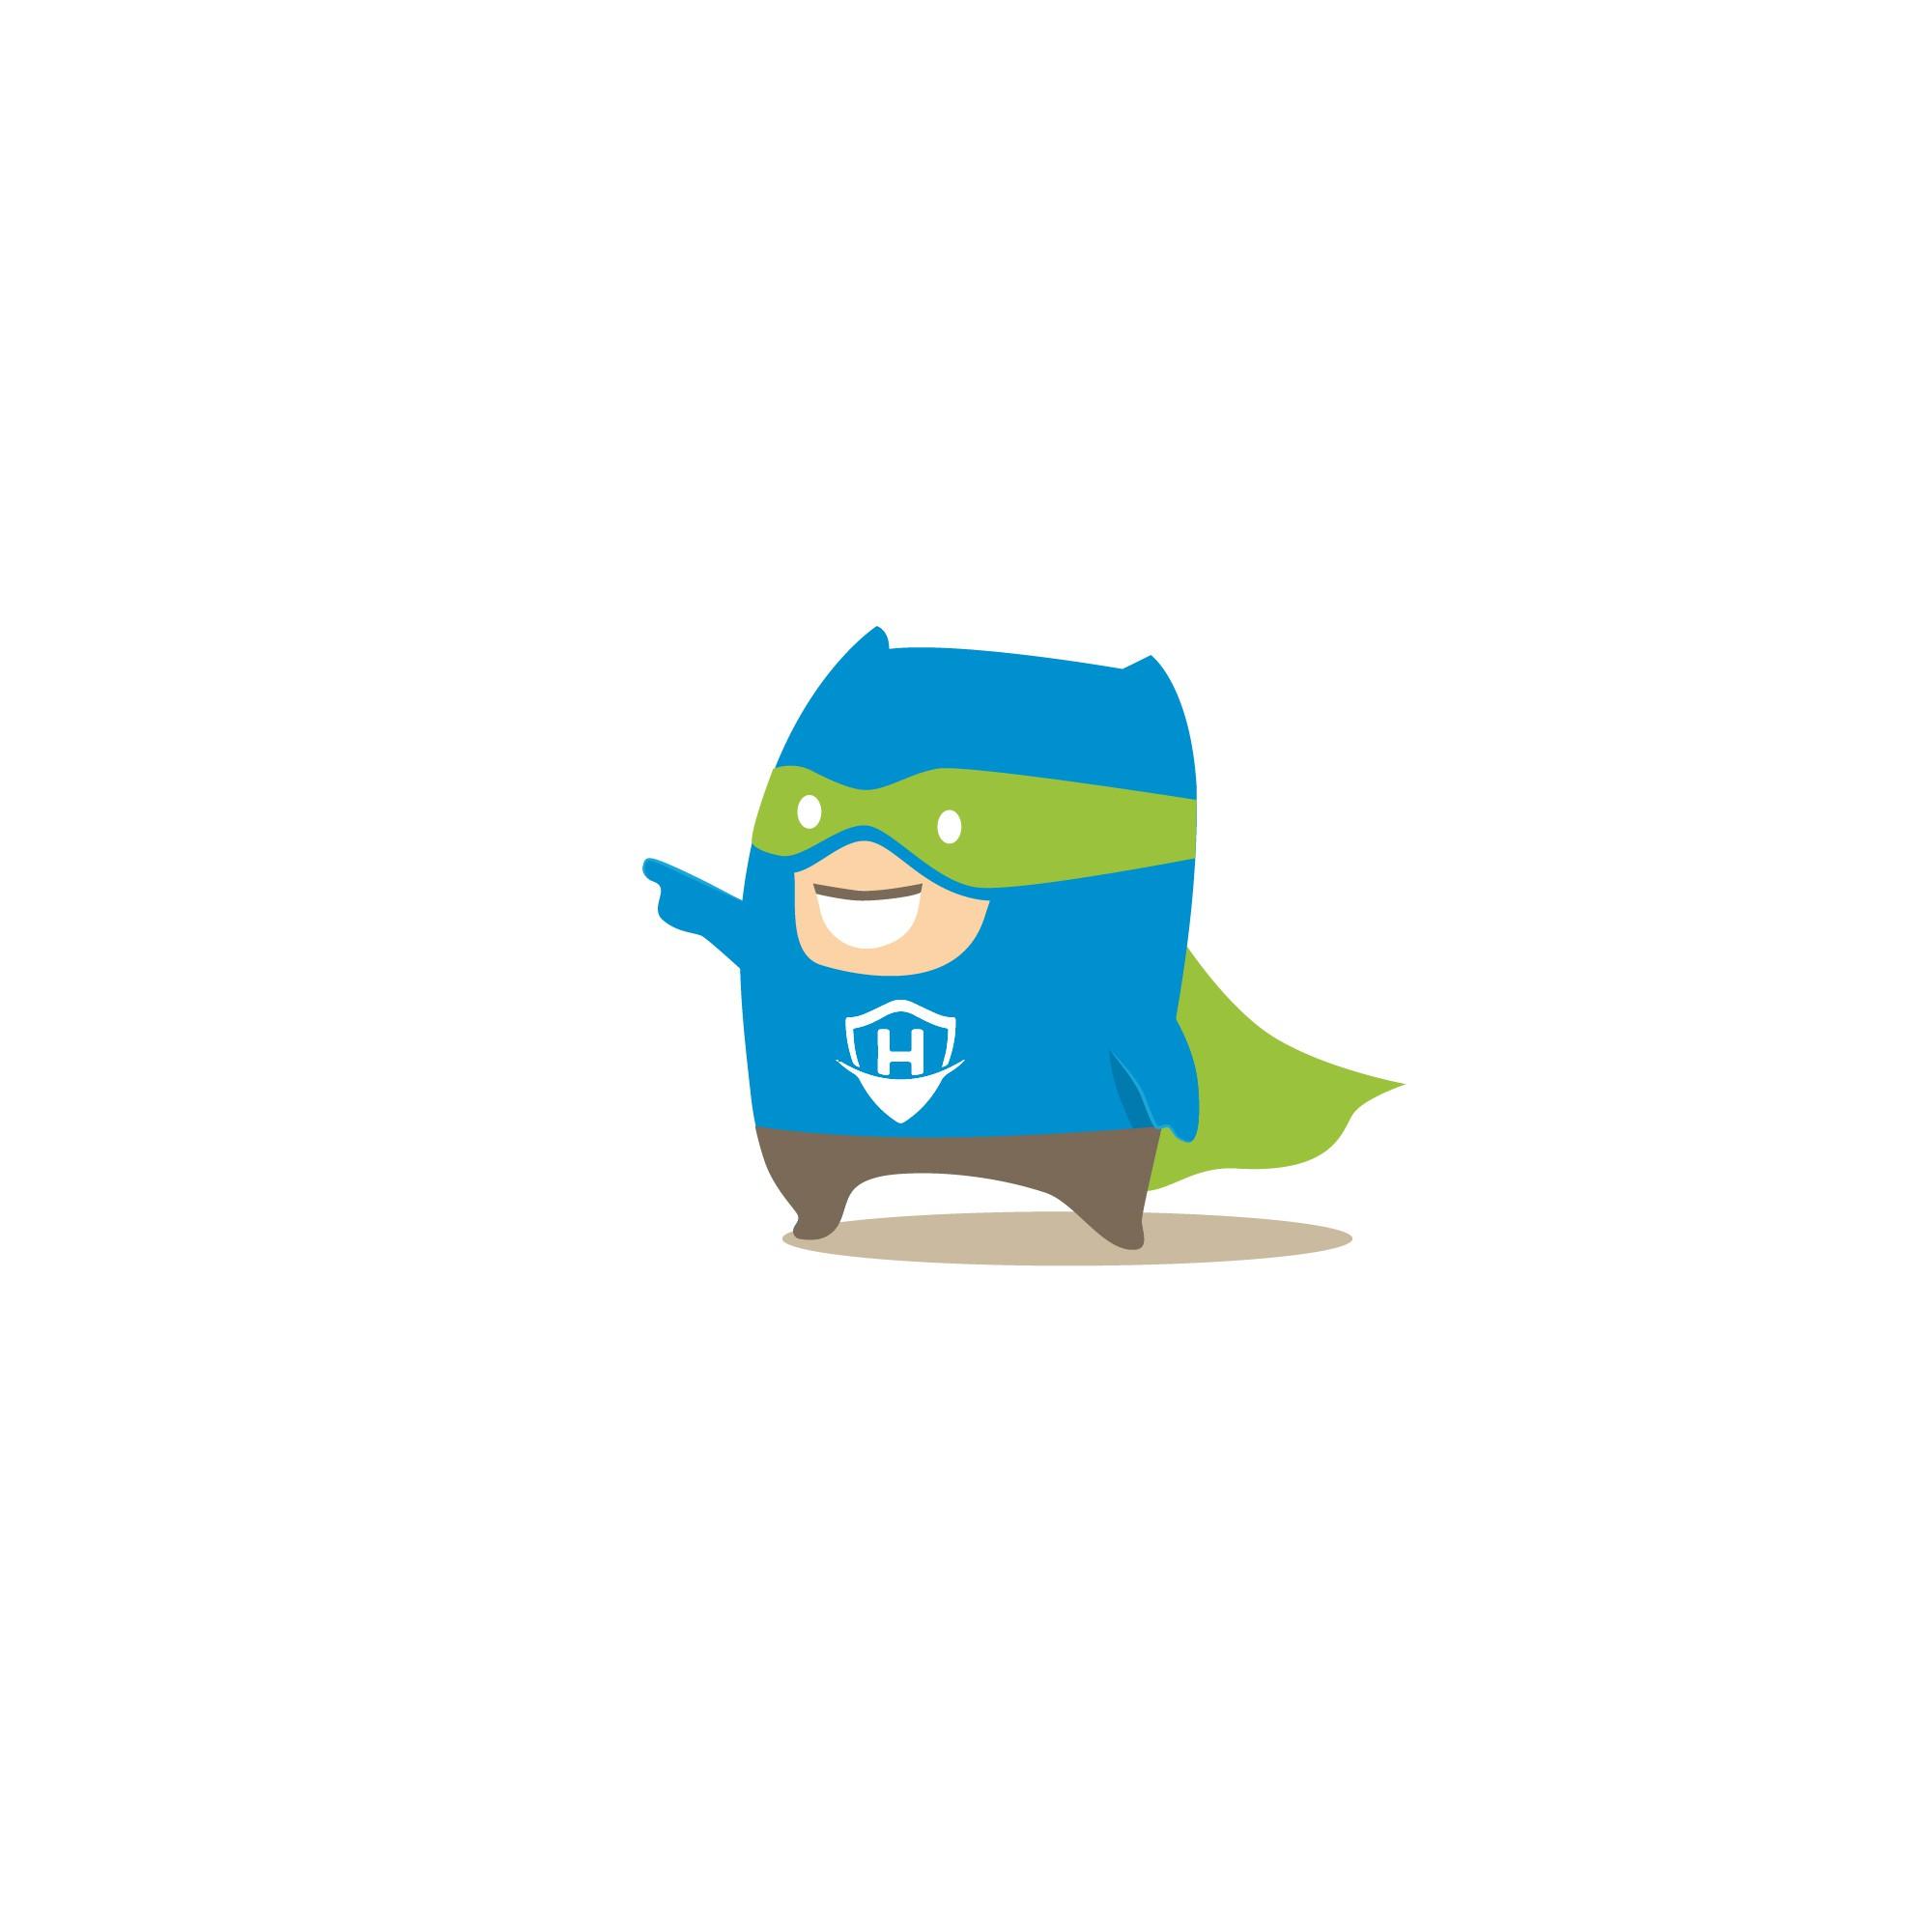 Super Hero Digital Illustration - HostingHero (Hosting Consultant)